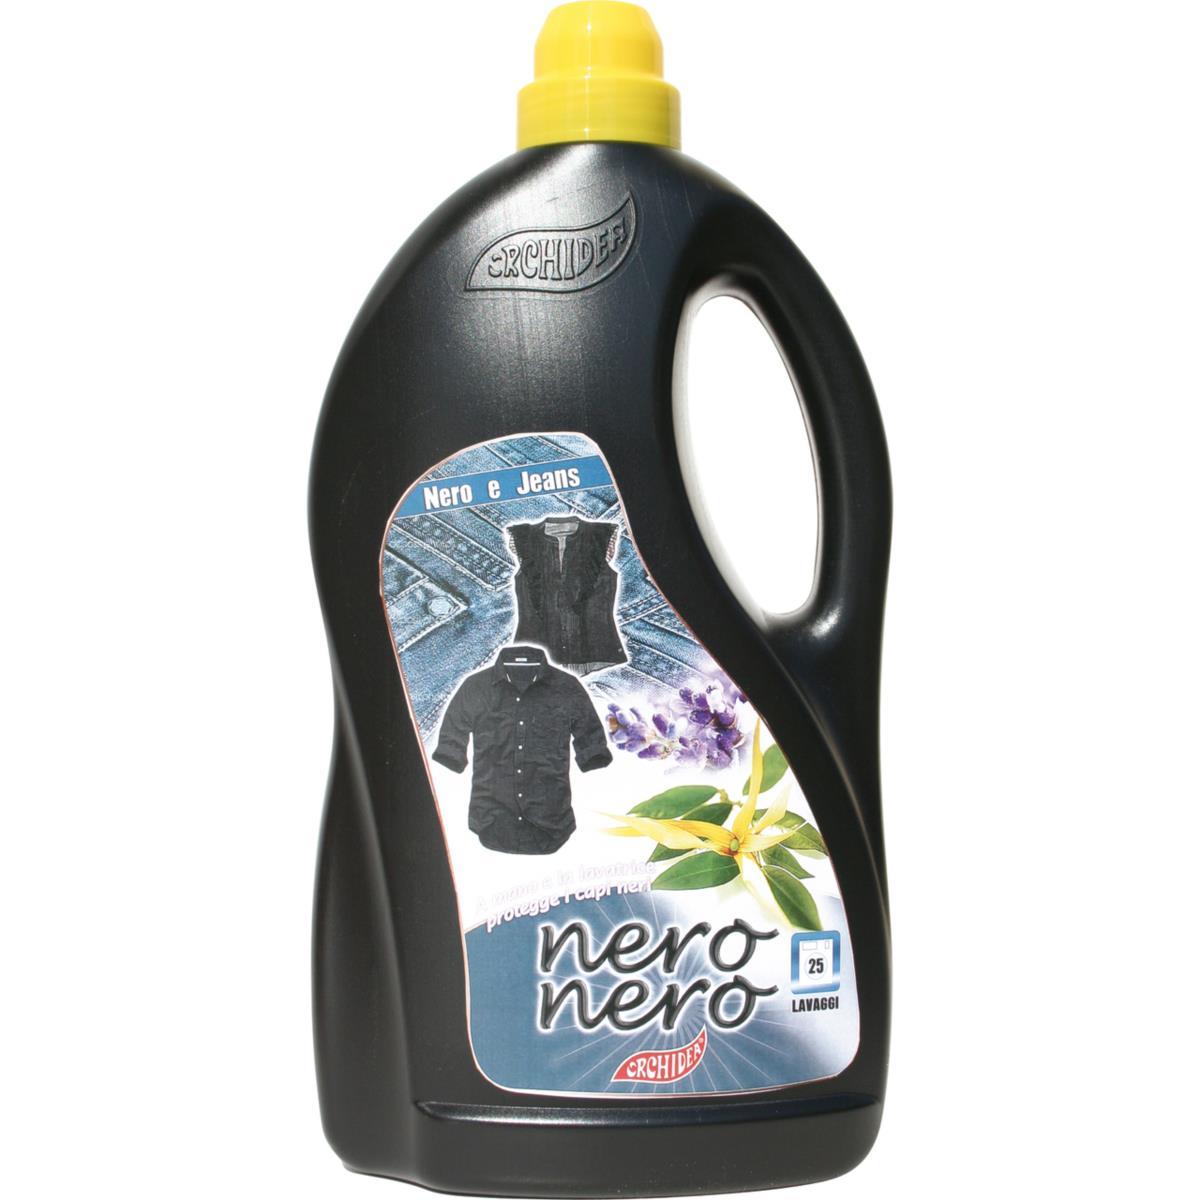 Detersivo Lavatrice Nero 25 lavaggi